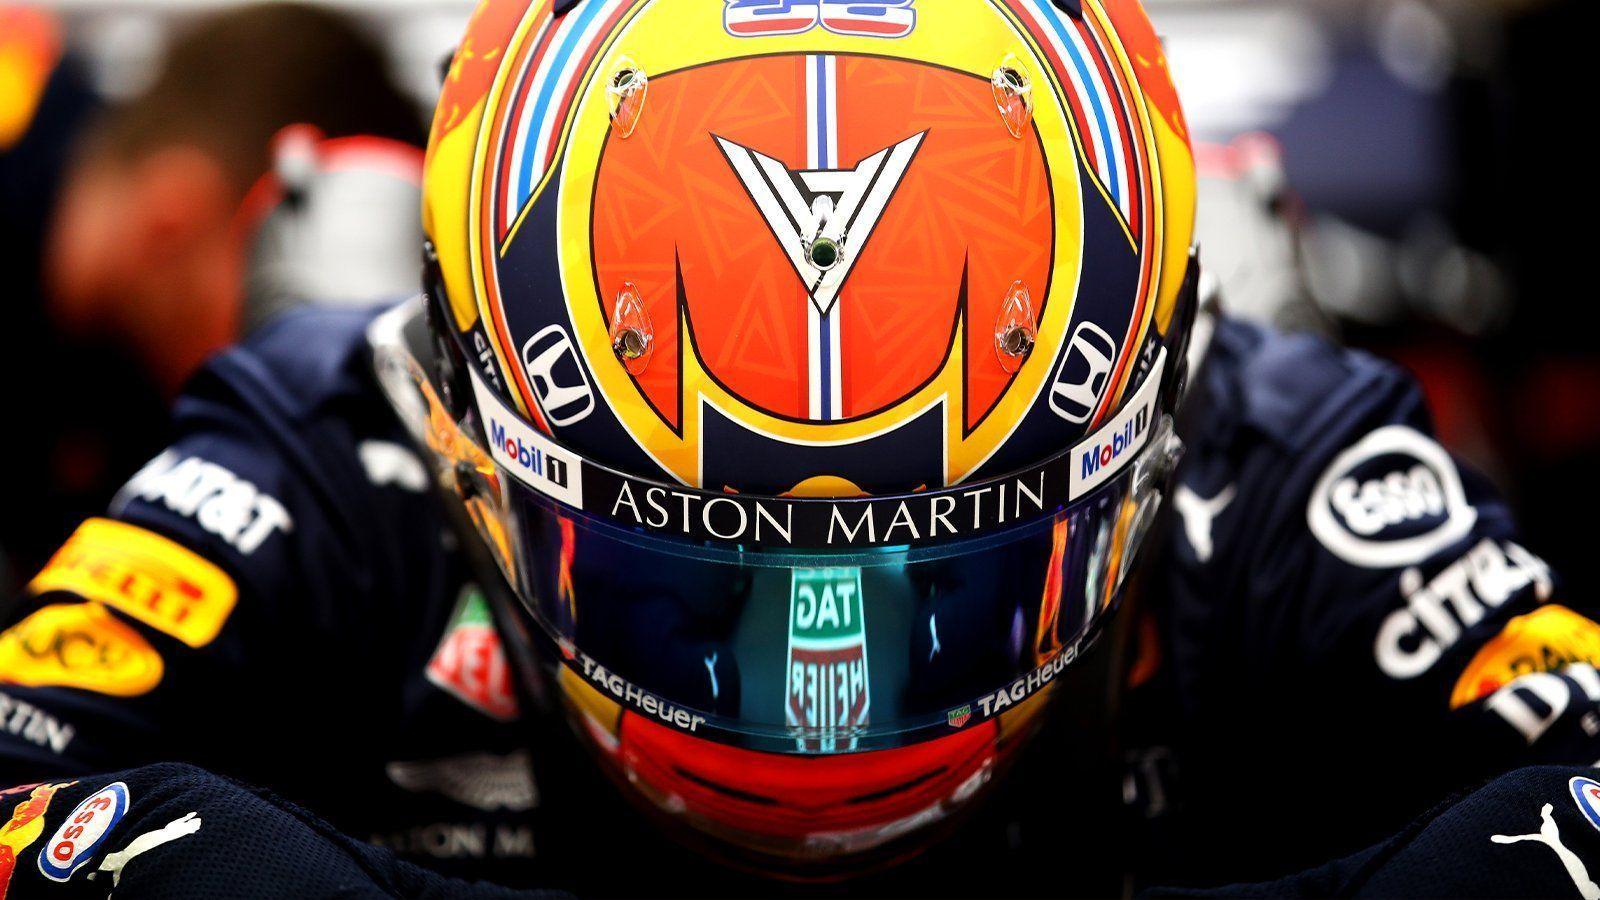 Alexander Albon, Red Bull Racing F1